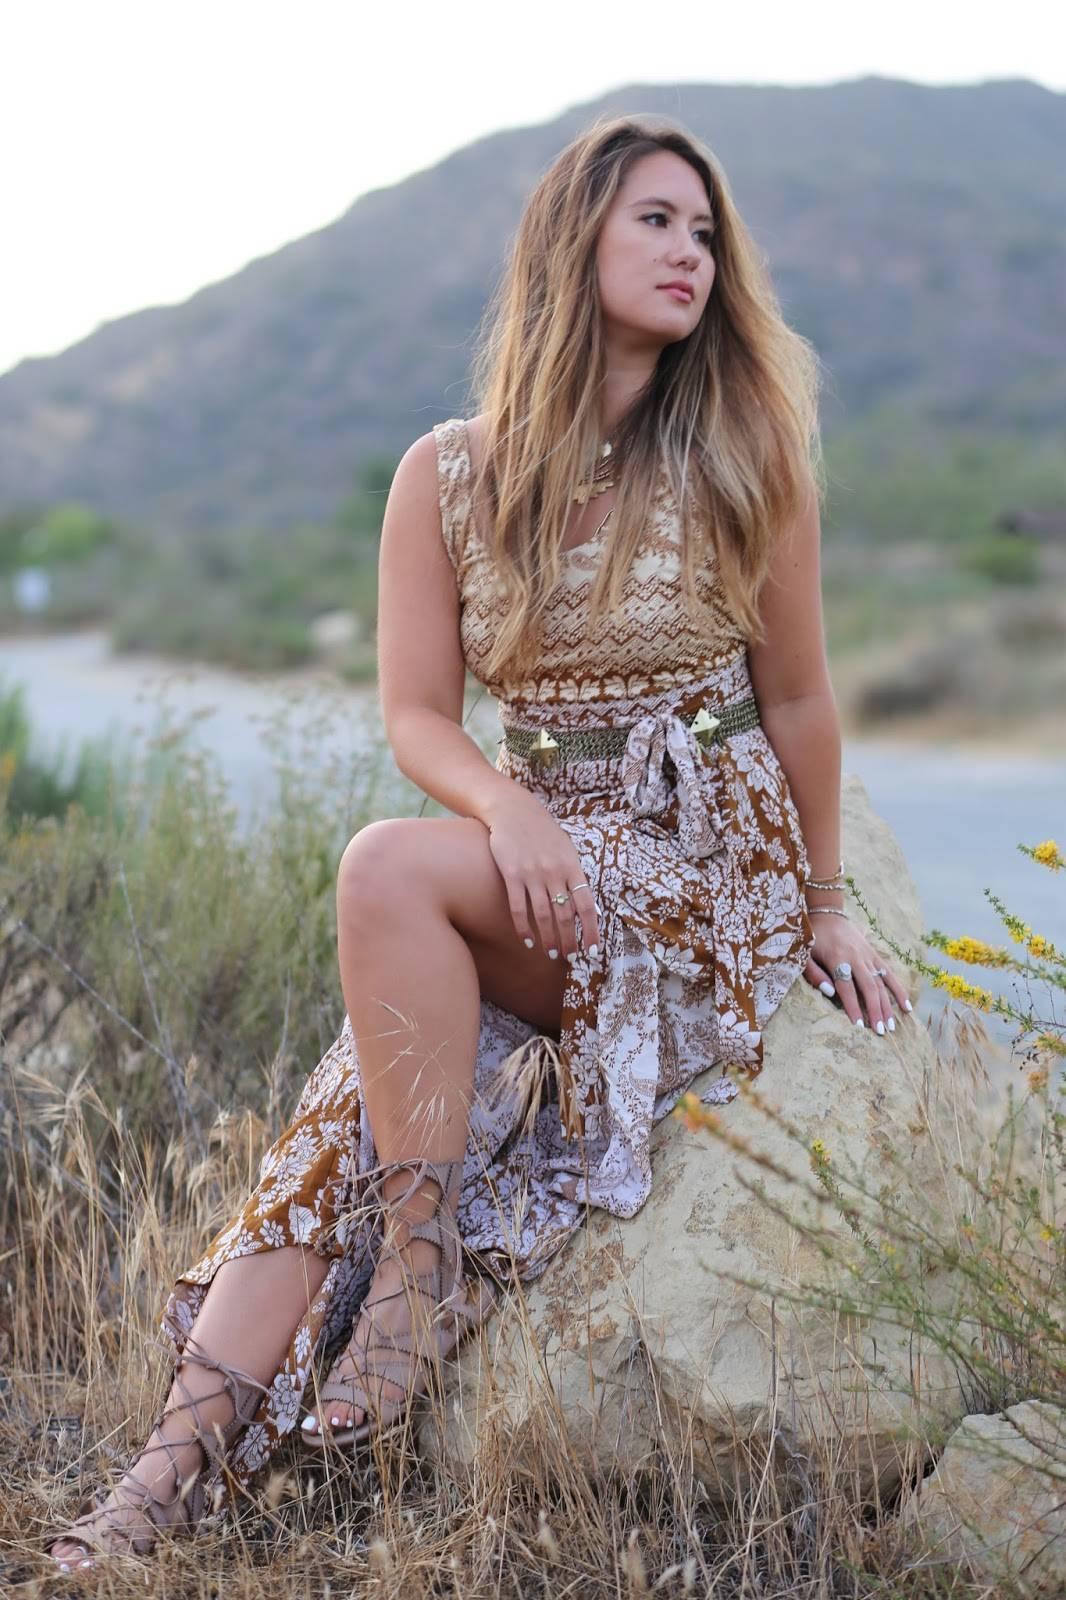 Forever 21 style | fashion | roadtrip style | California | California style | beauty blogger Mash Elle